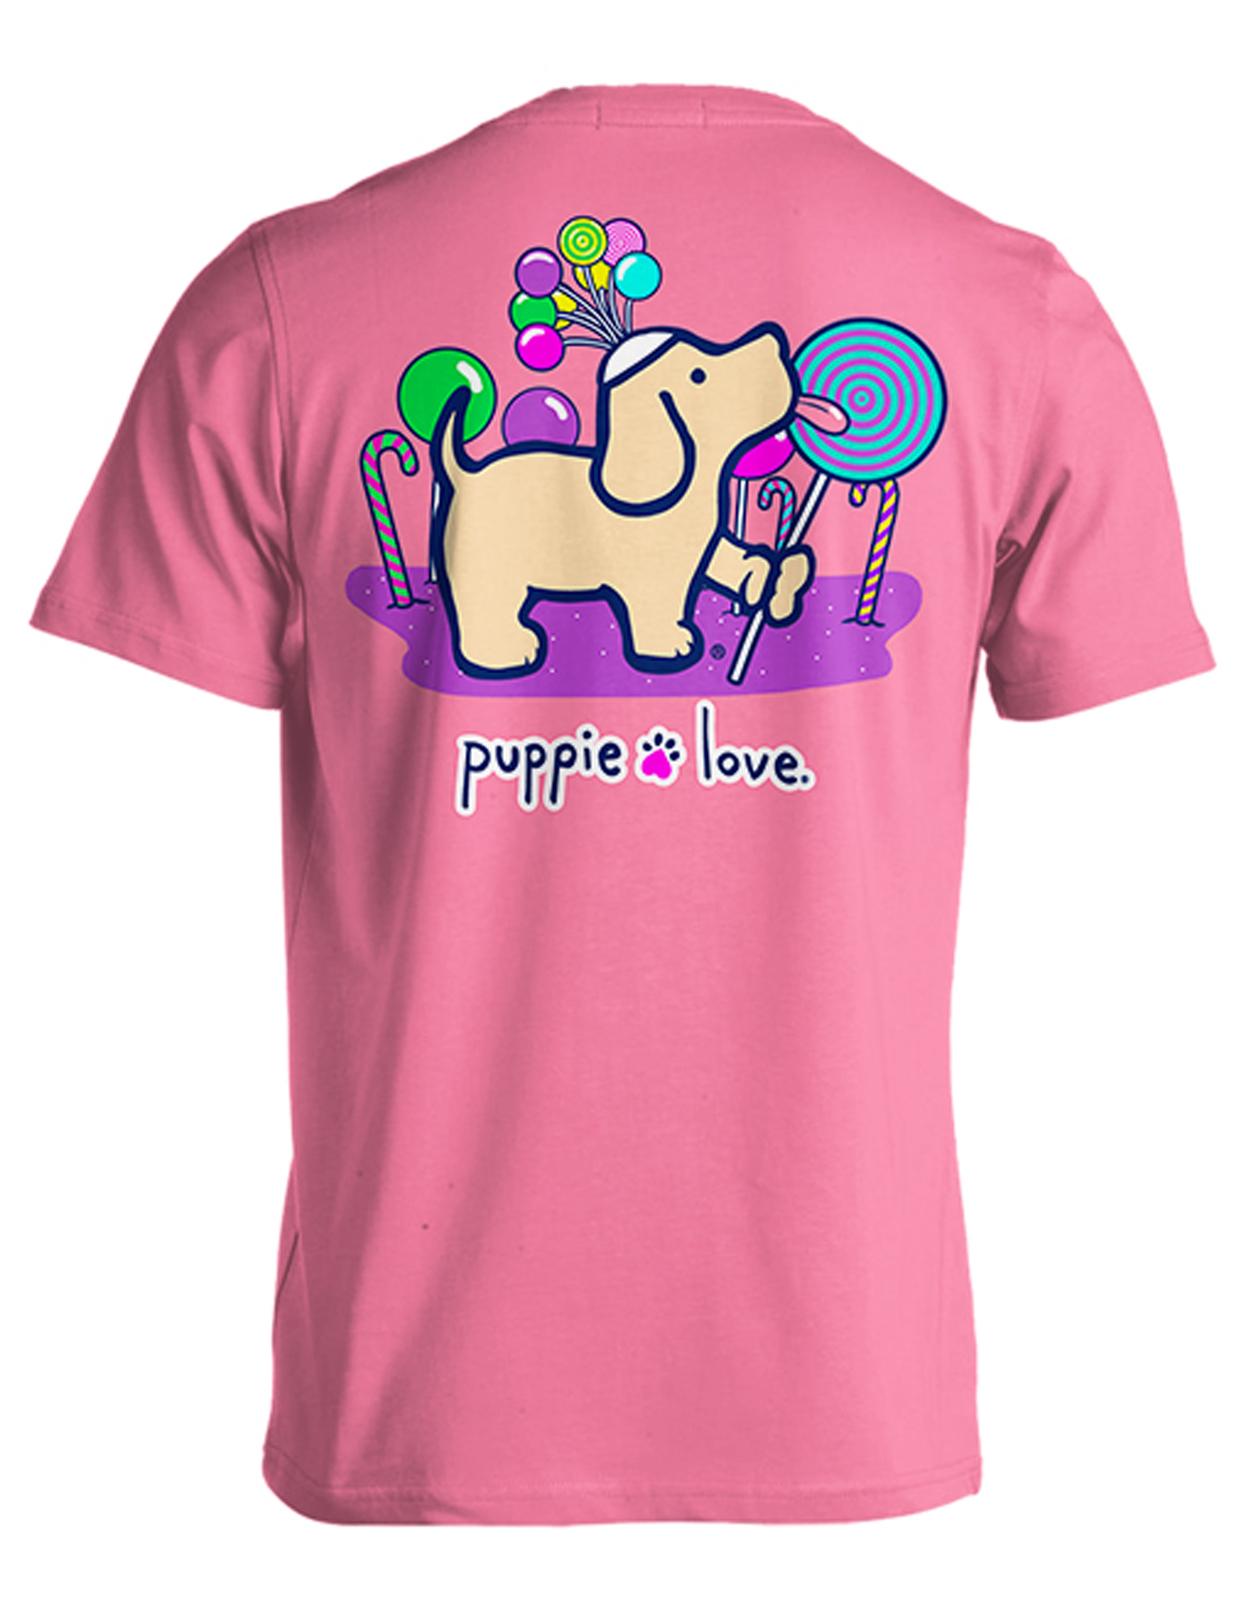 Lollipop pup 202 aza ss 1